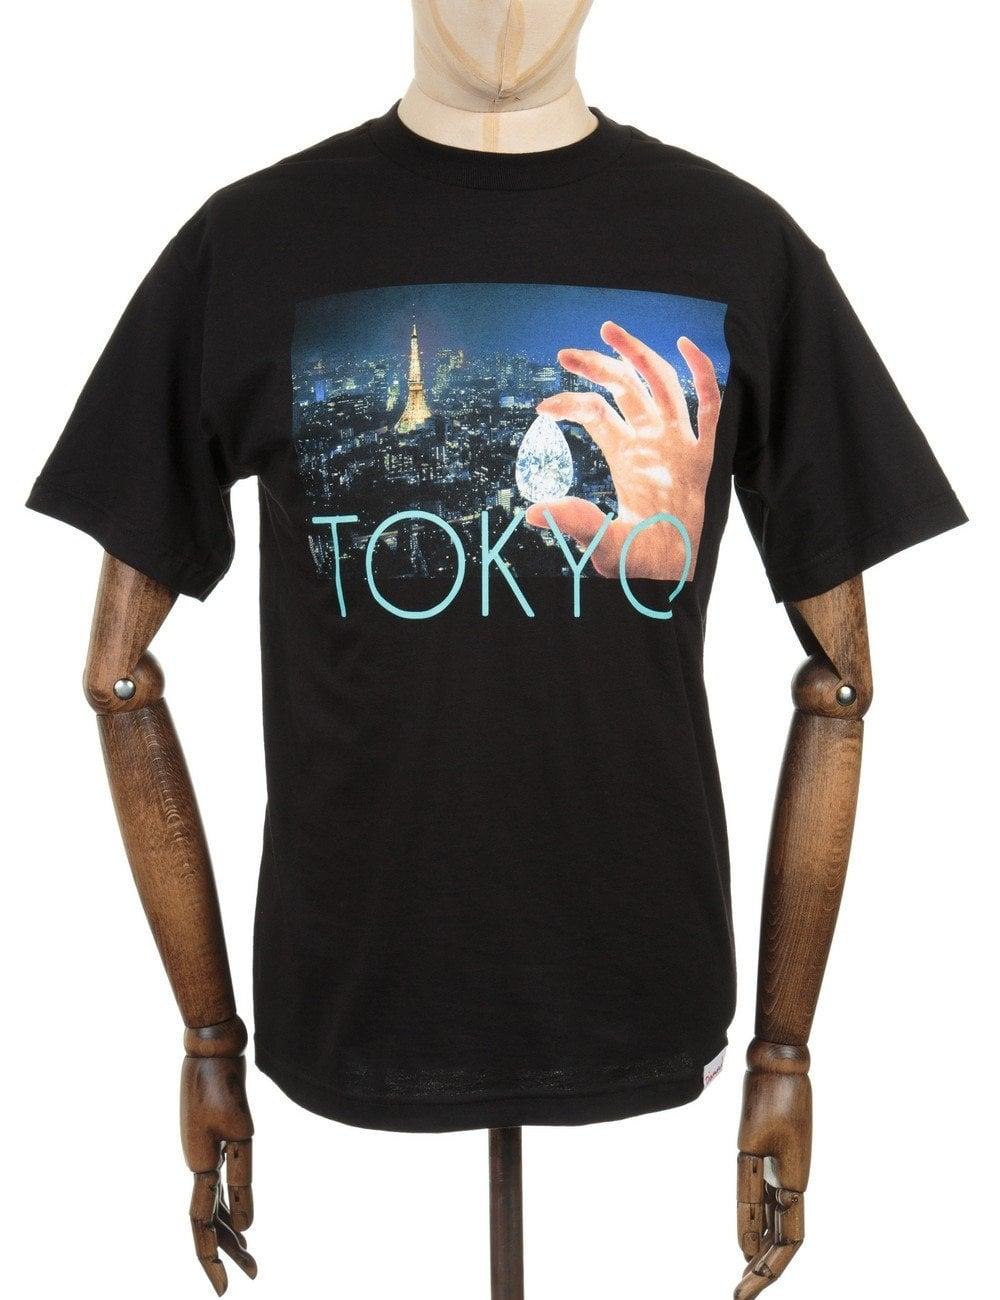 de913d0651e3 Tokyo Life Photo T-shirt - Black Sale · Diamond Supply Co ...